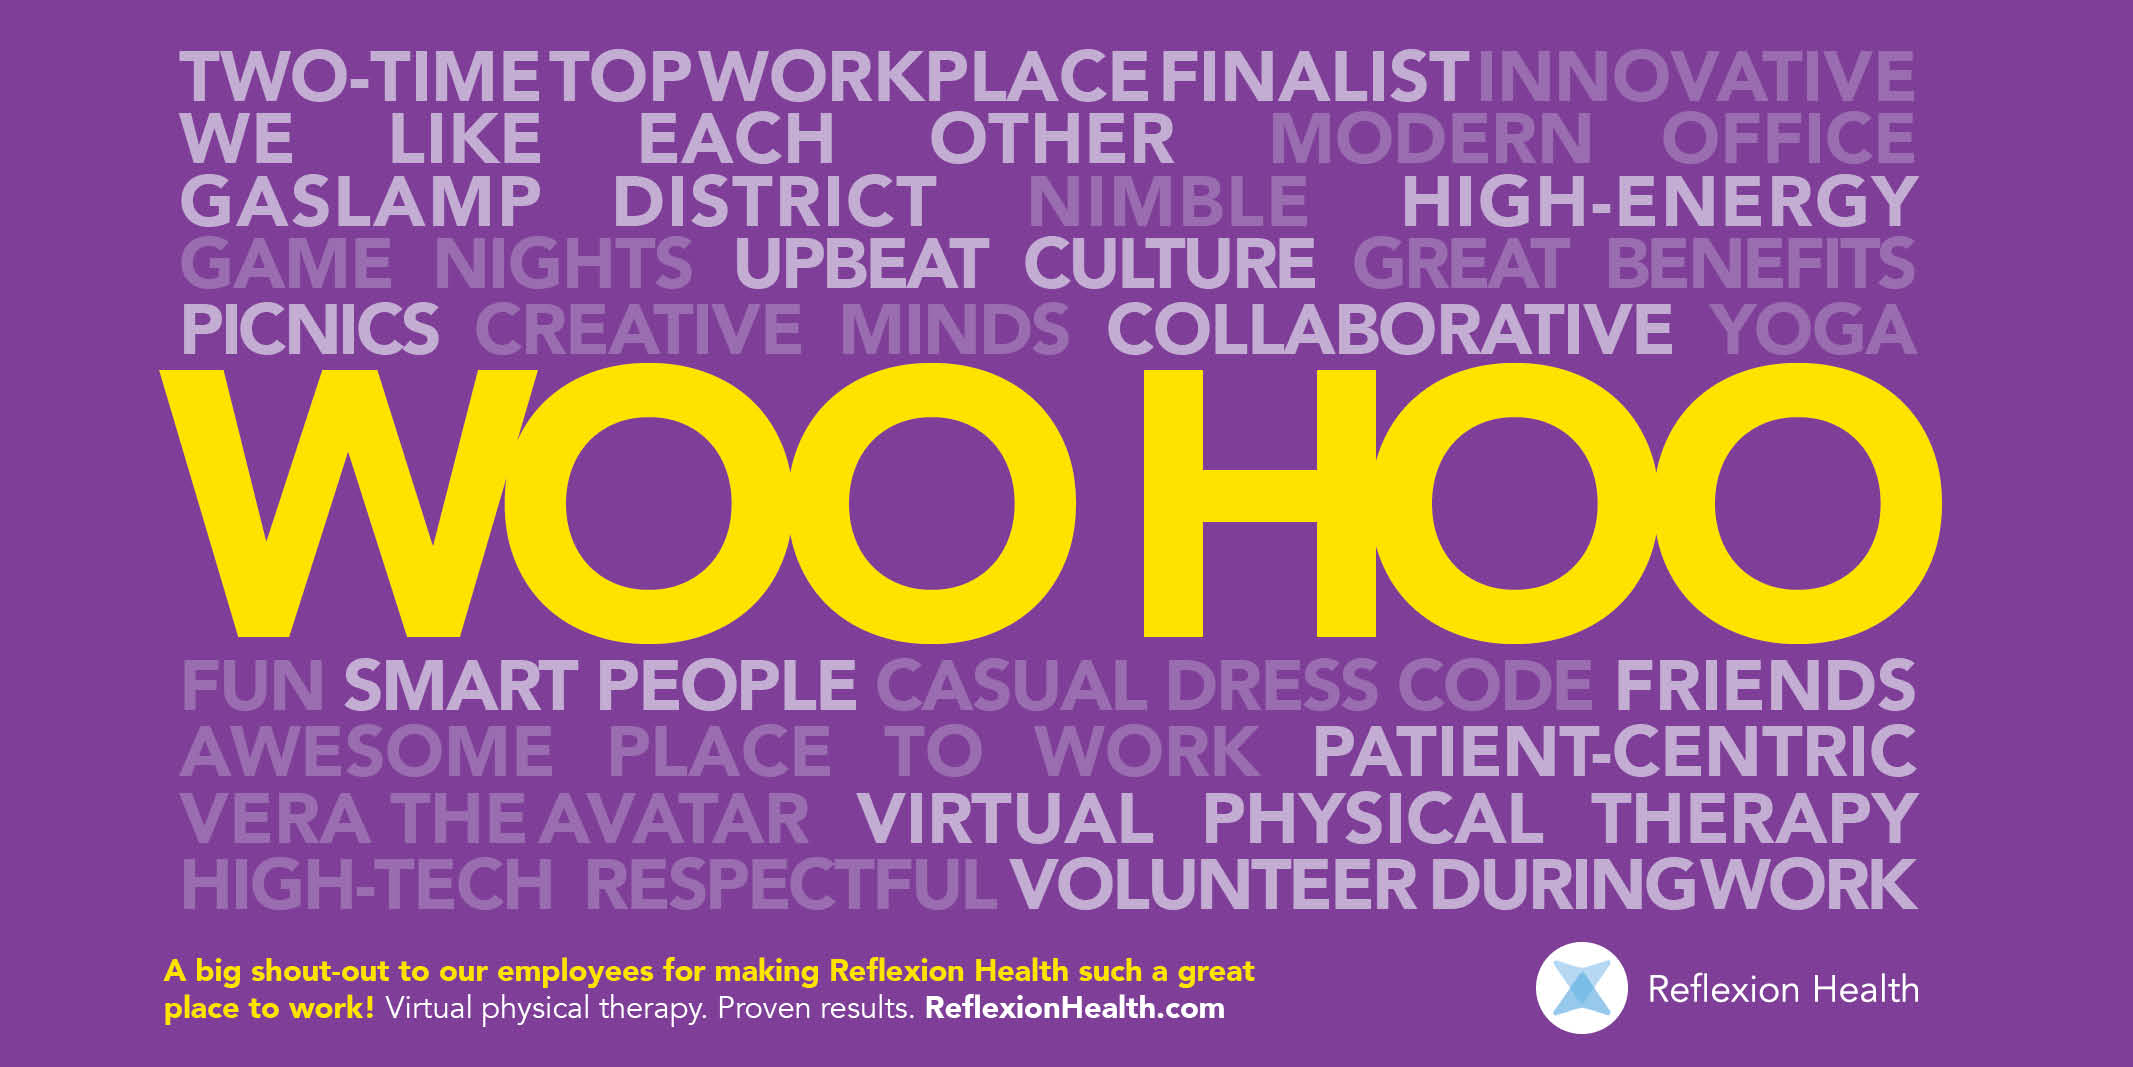 san-diego-top-workplace-2018